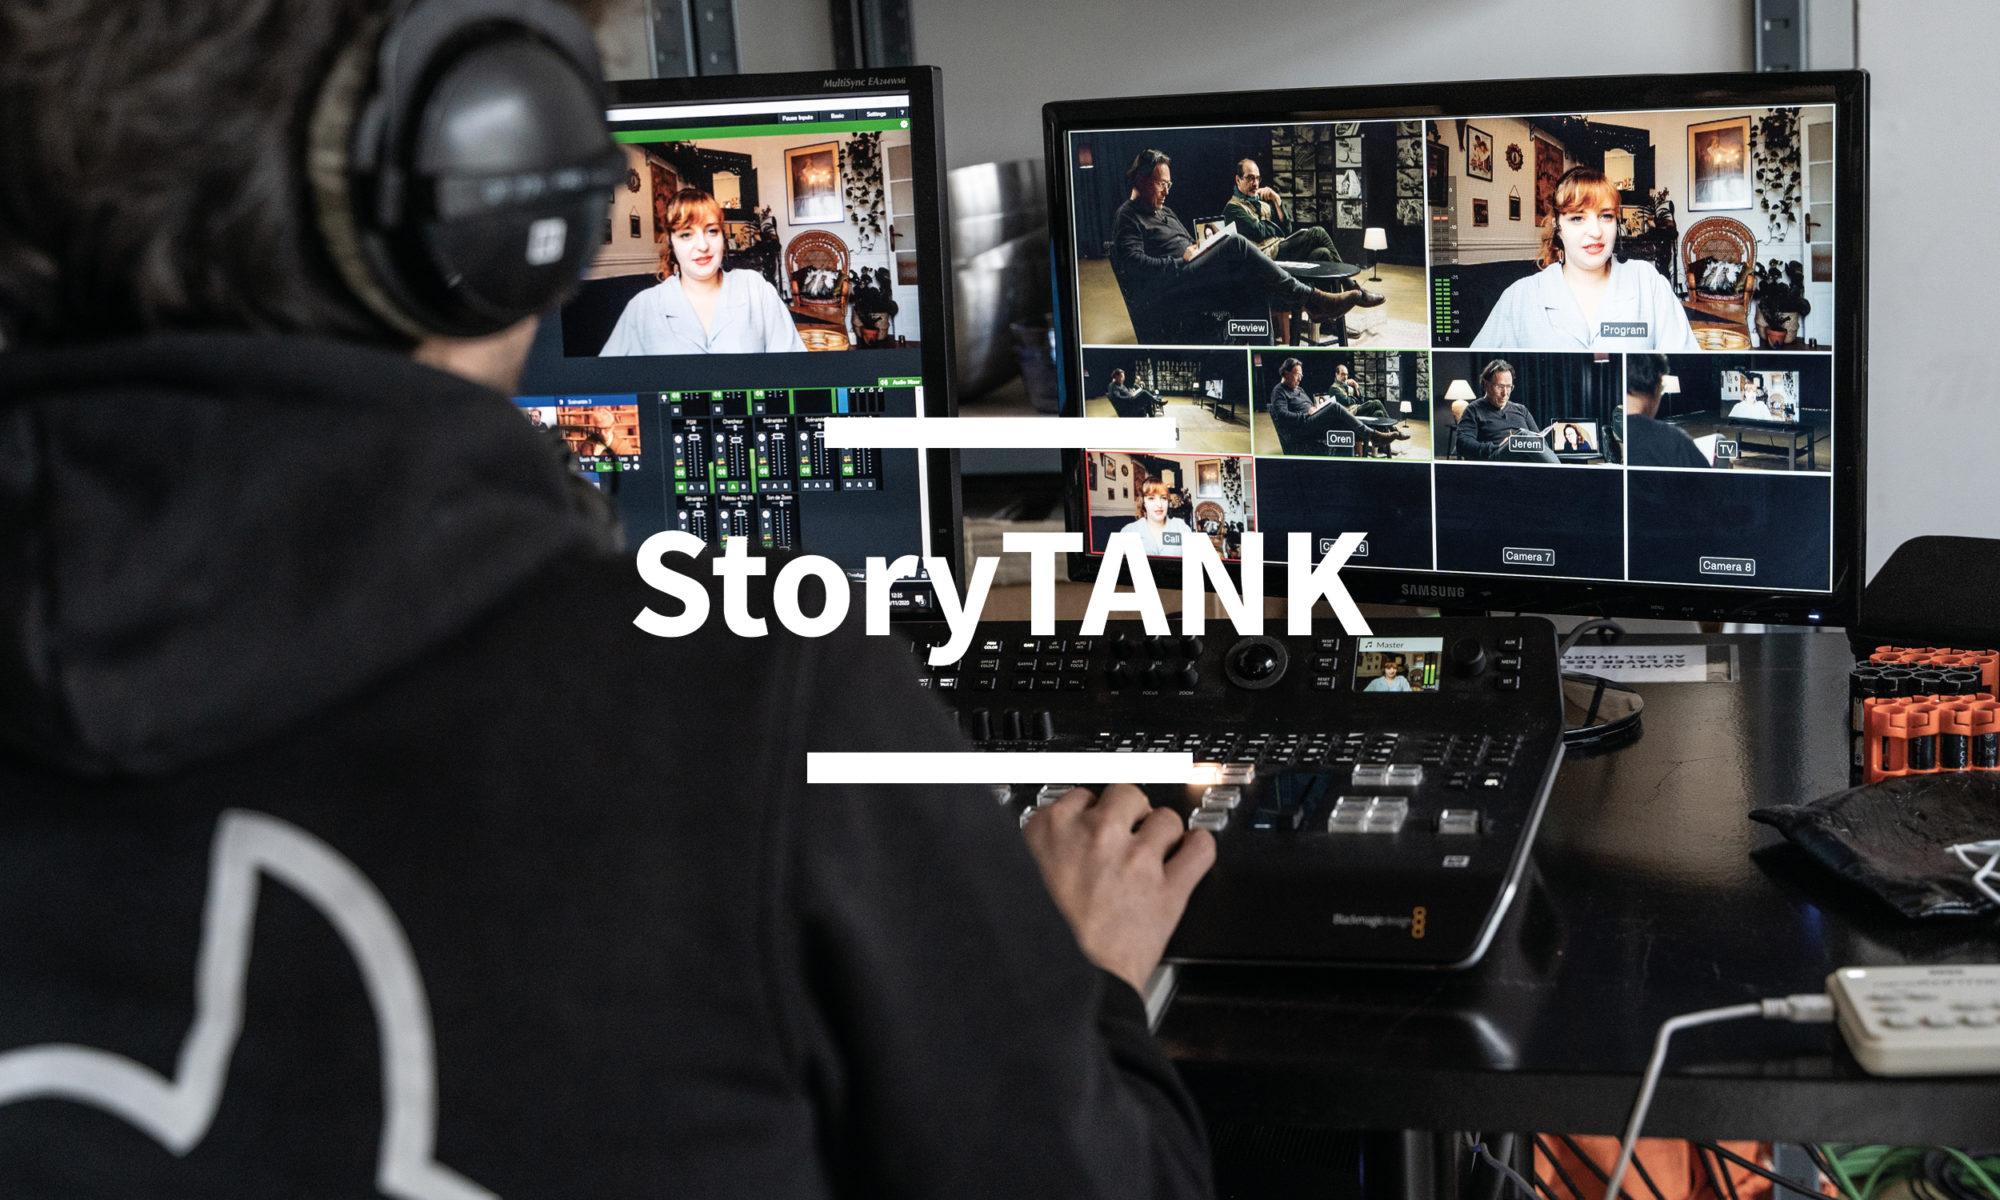 StoryTANK | Think Tank bringing together screenwriters& storytellers